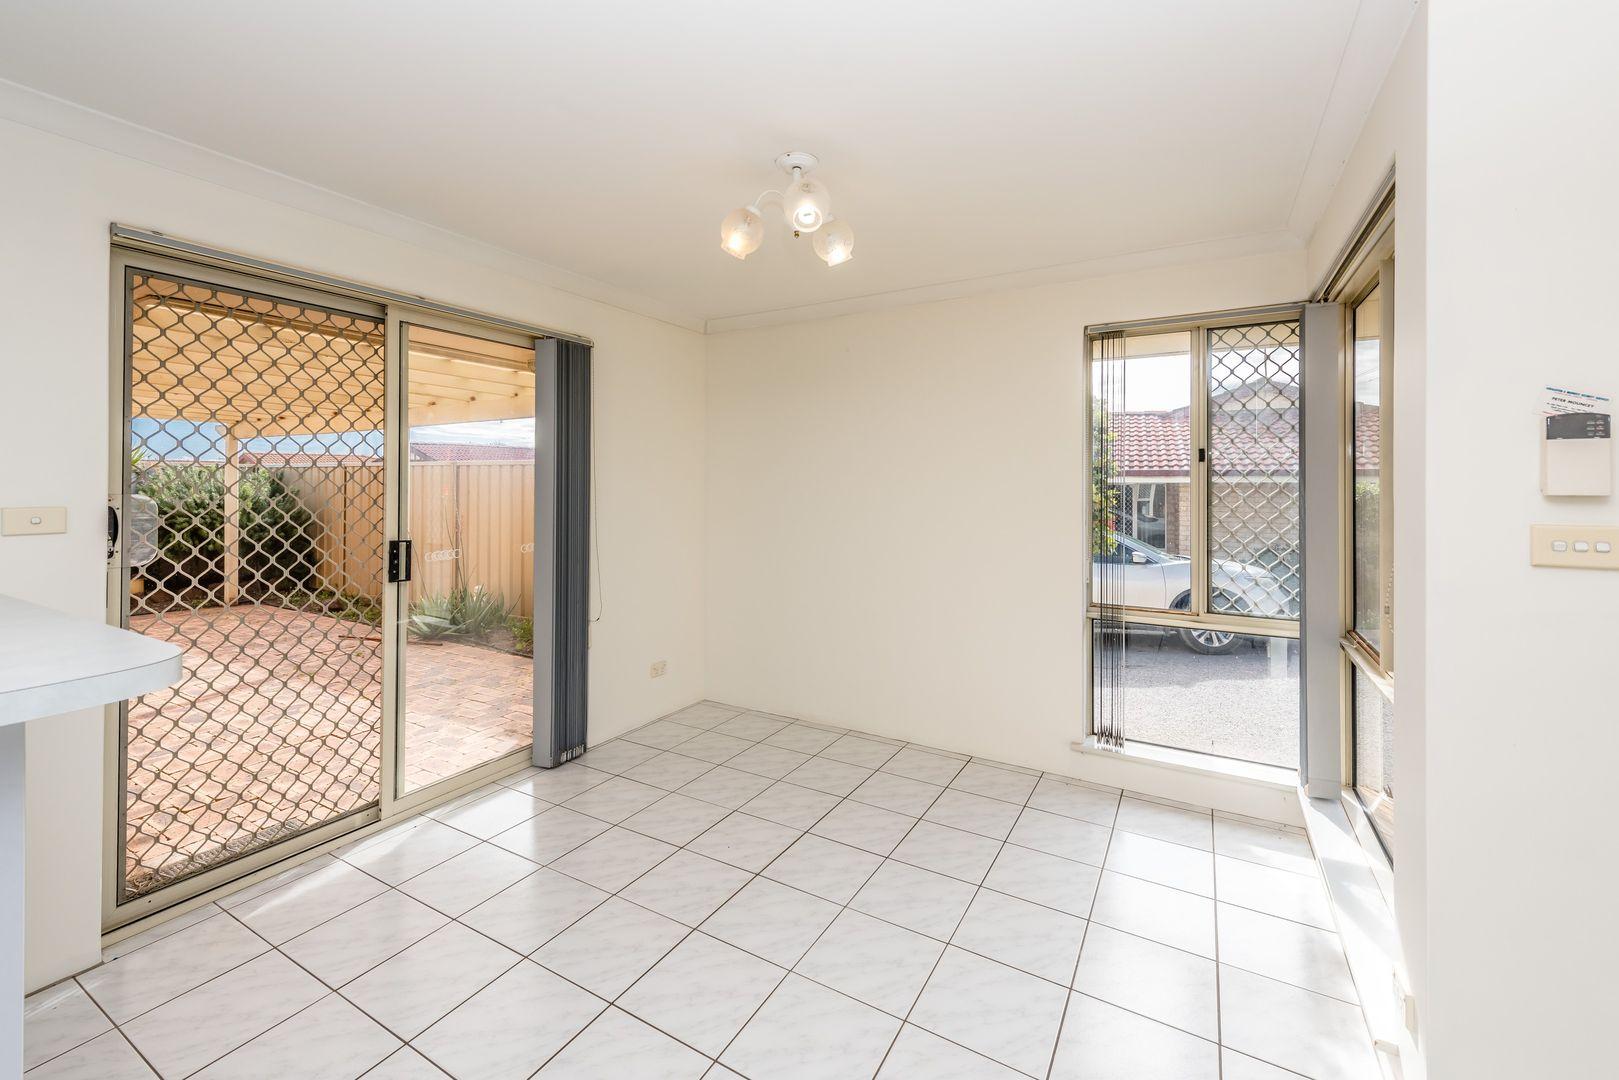 1/206 Durlacher Street, Geraldton WA 6530, Image 2